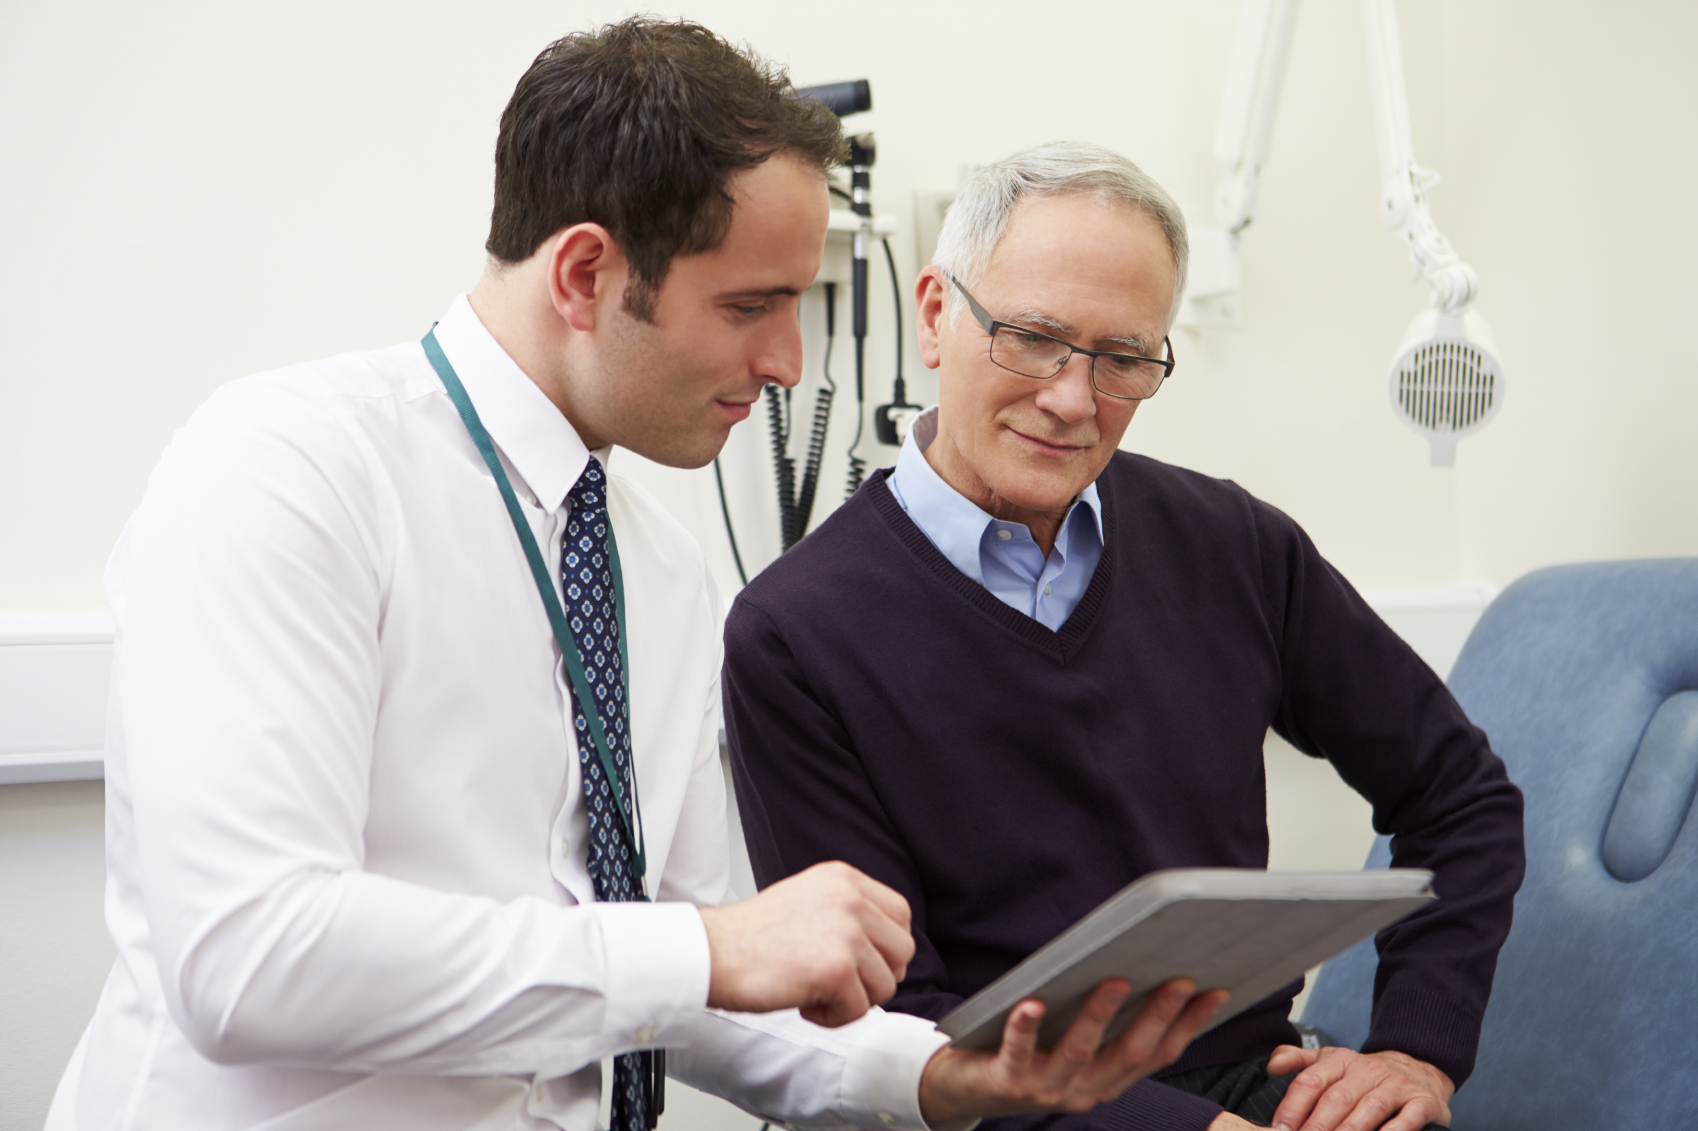 fa4573c5aad34 Time to rethink the debate on PSA testing - Harvard Health Blog ...